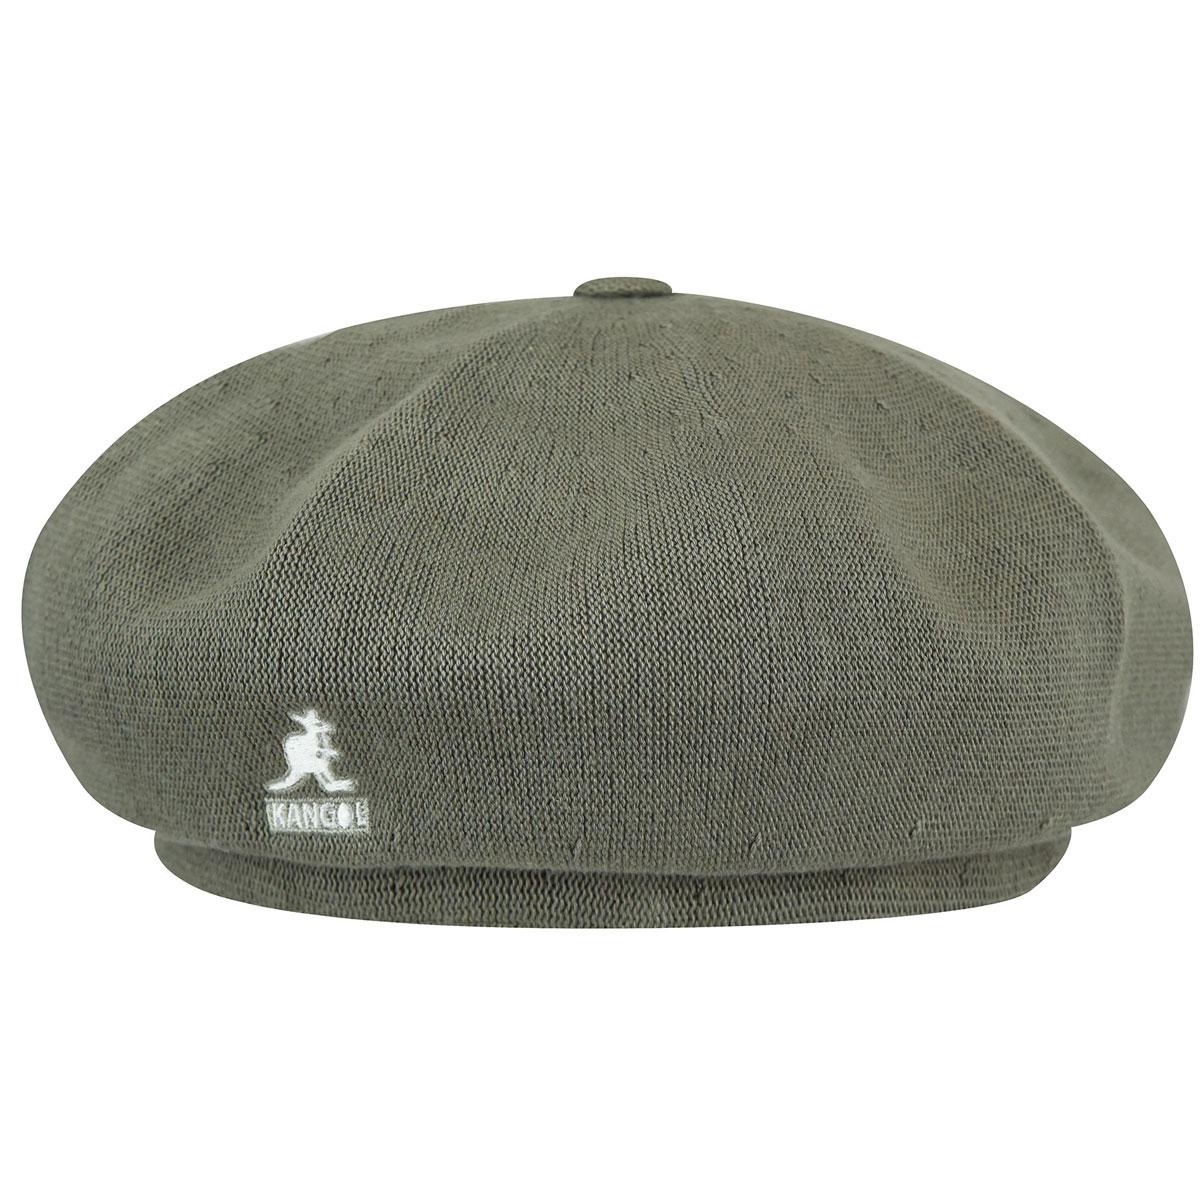 Unisex Kangol Black Bamboo Jax Beret Hat